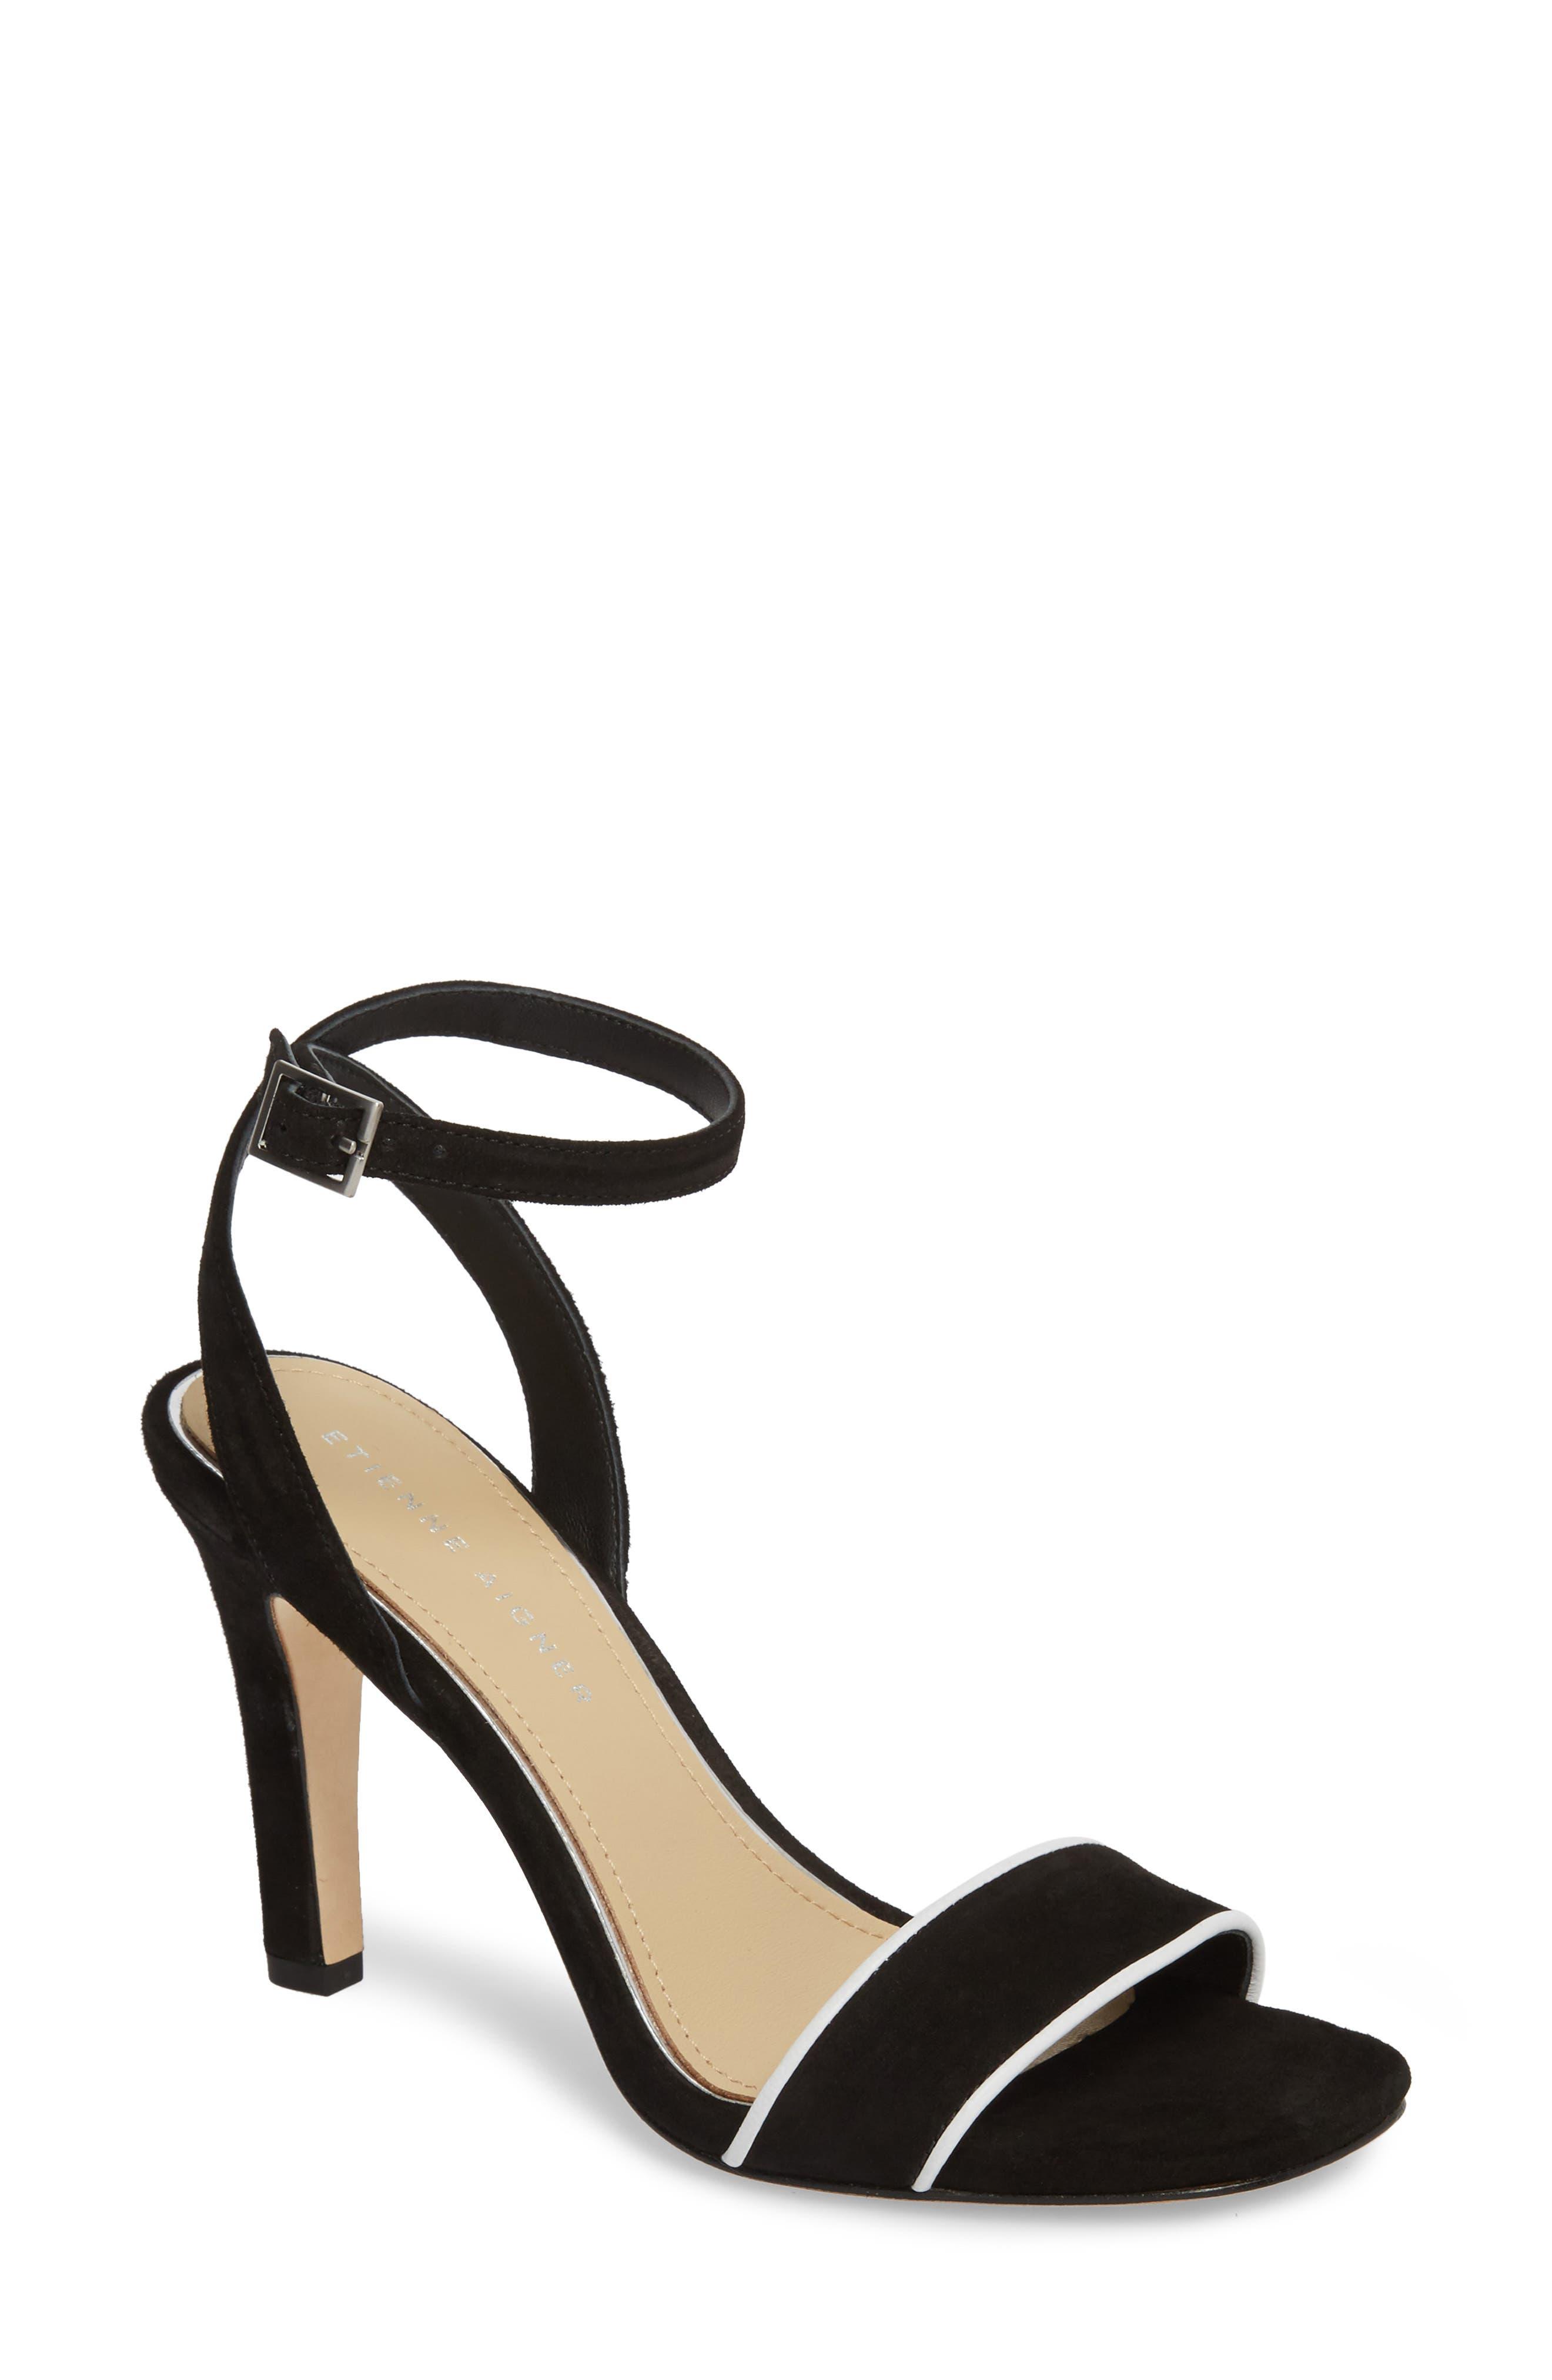 Martini Sandal,                         Main,                         color, BLACK/ WHITE SUEDE